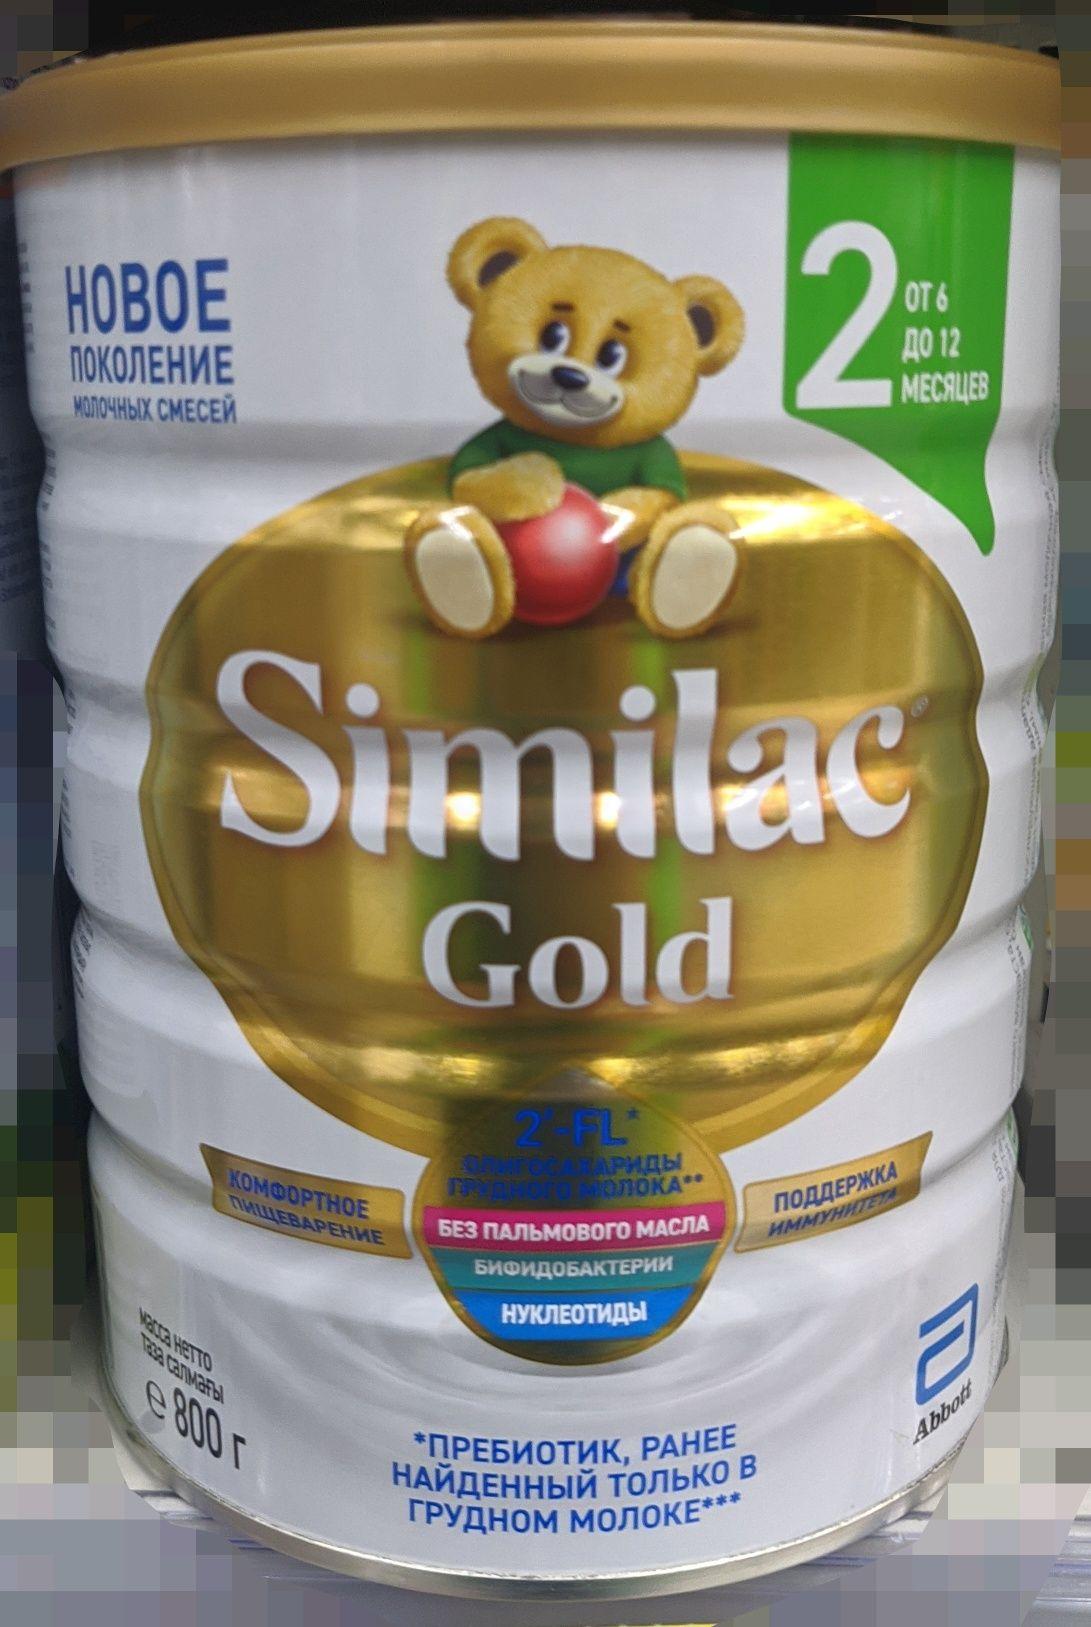 Similac gold 2, 800 гр, сімілак голд